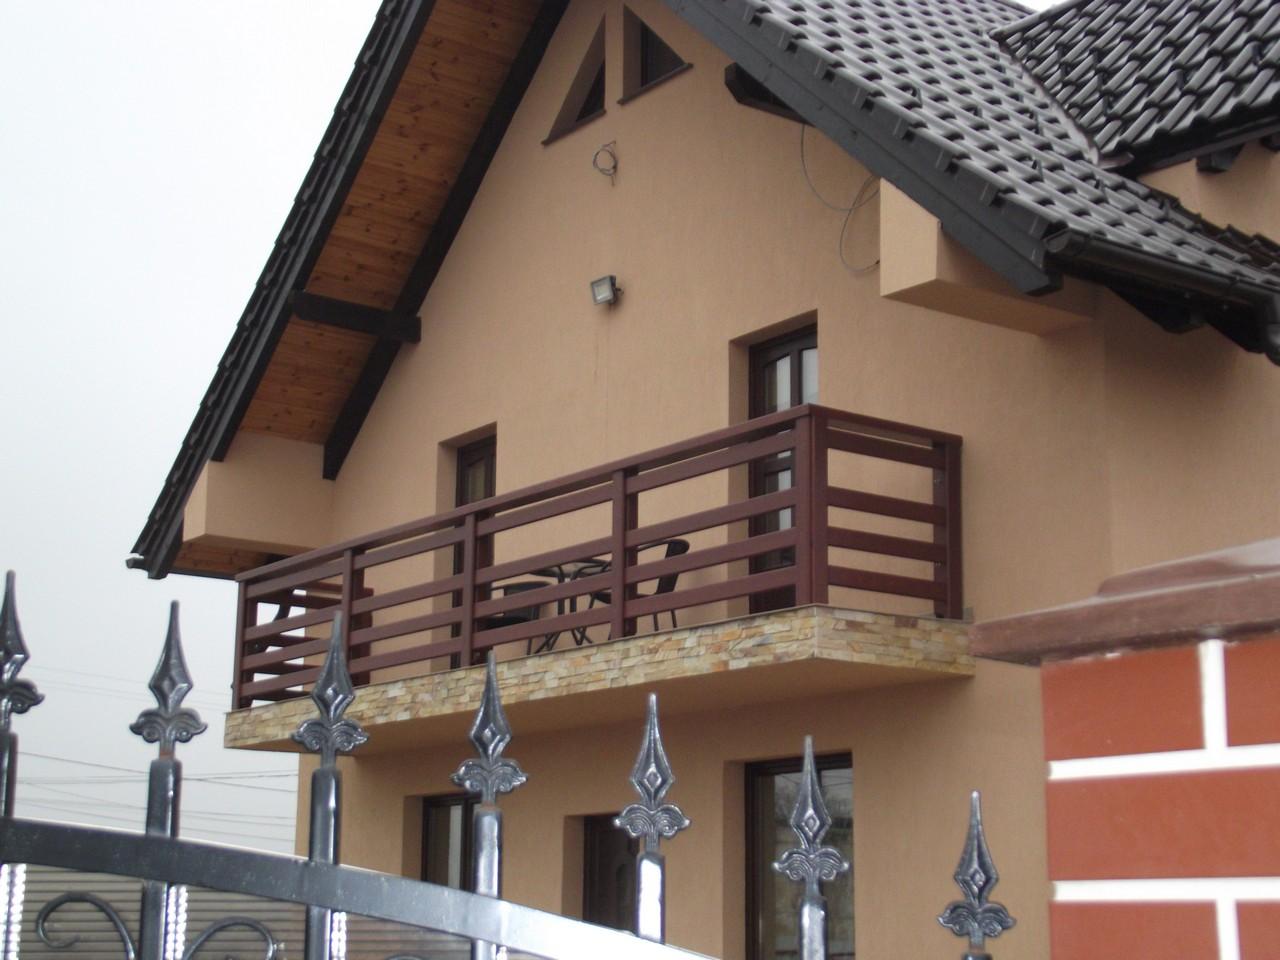 balustrade balcon balustrade balcon balustrada pentru protectie balcon mareste balustrade. Black Bedroom Furniture Sets. Home Design Ideas